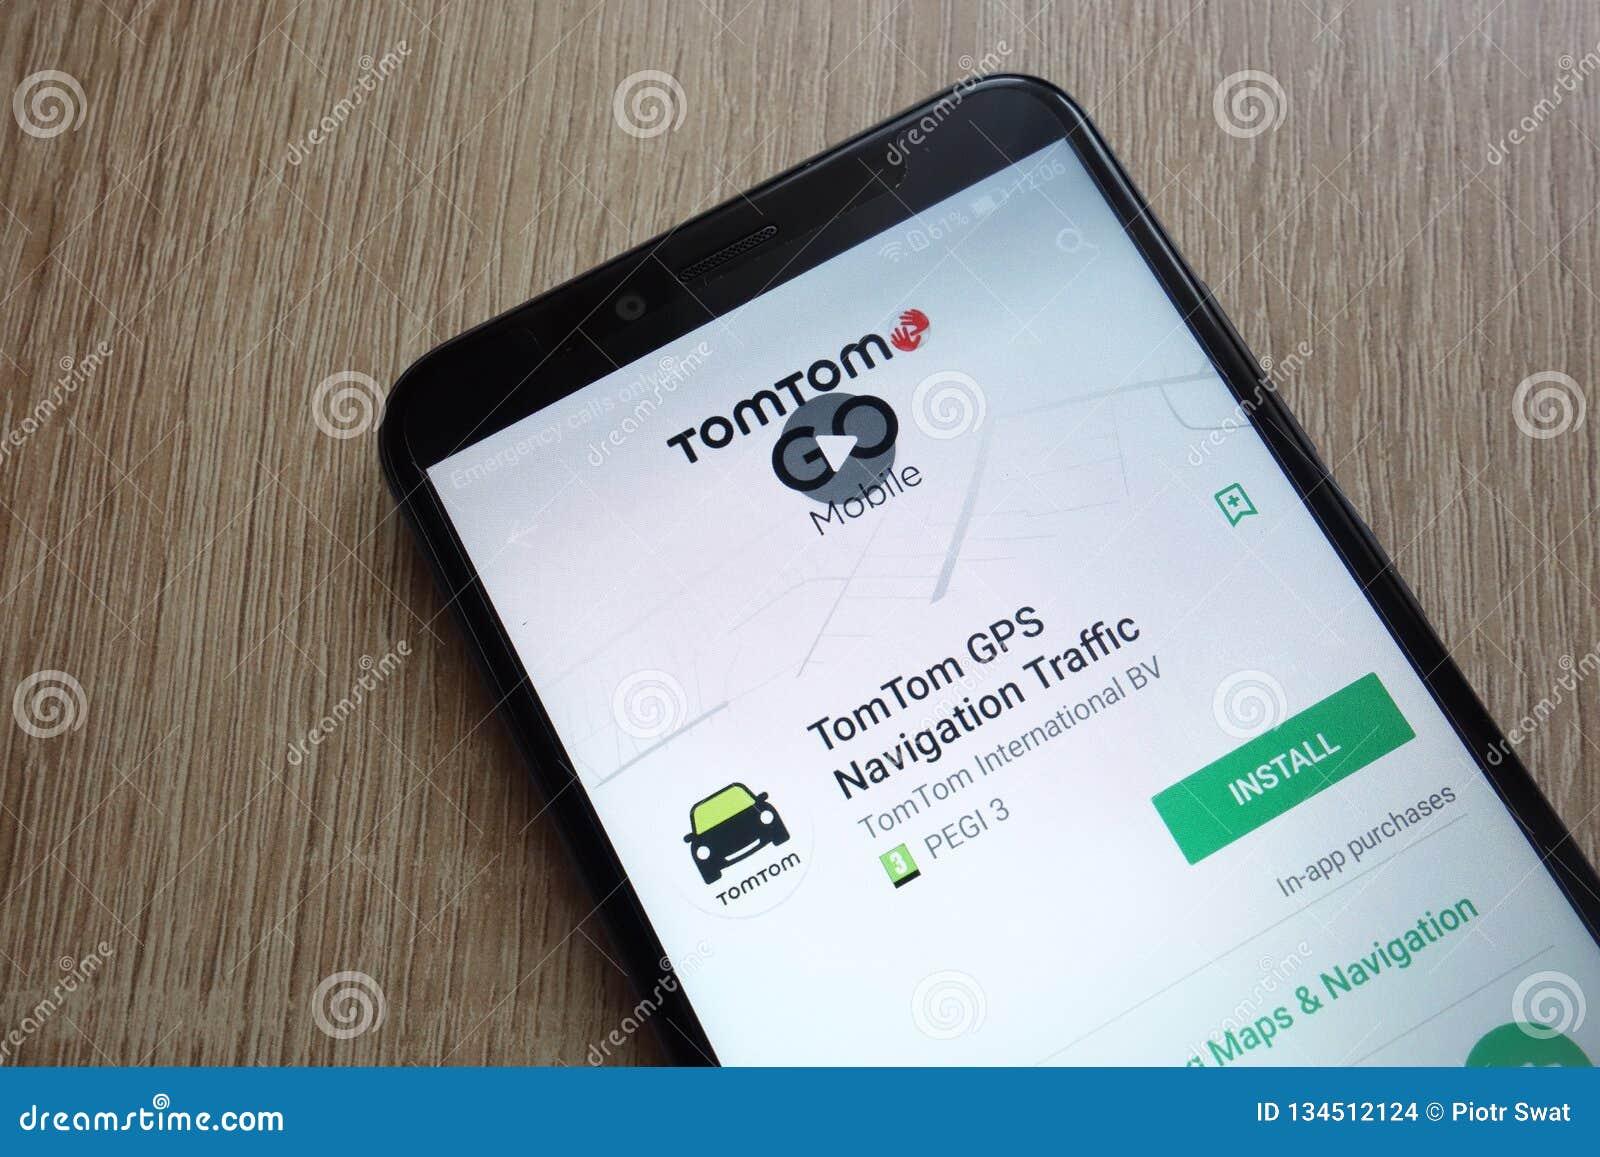 TomTom GPS Navigation Traffic App On Google Play Store